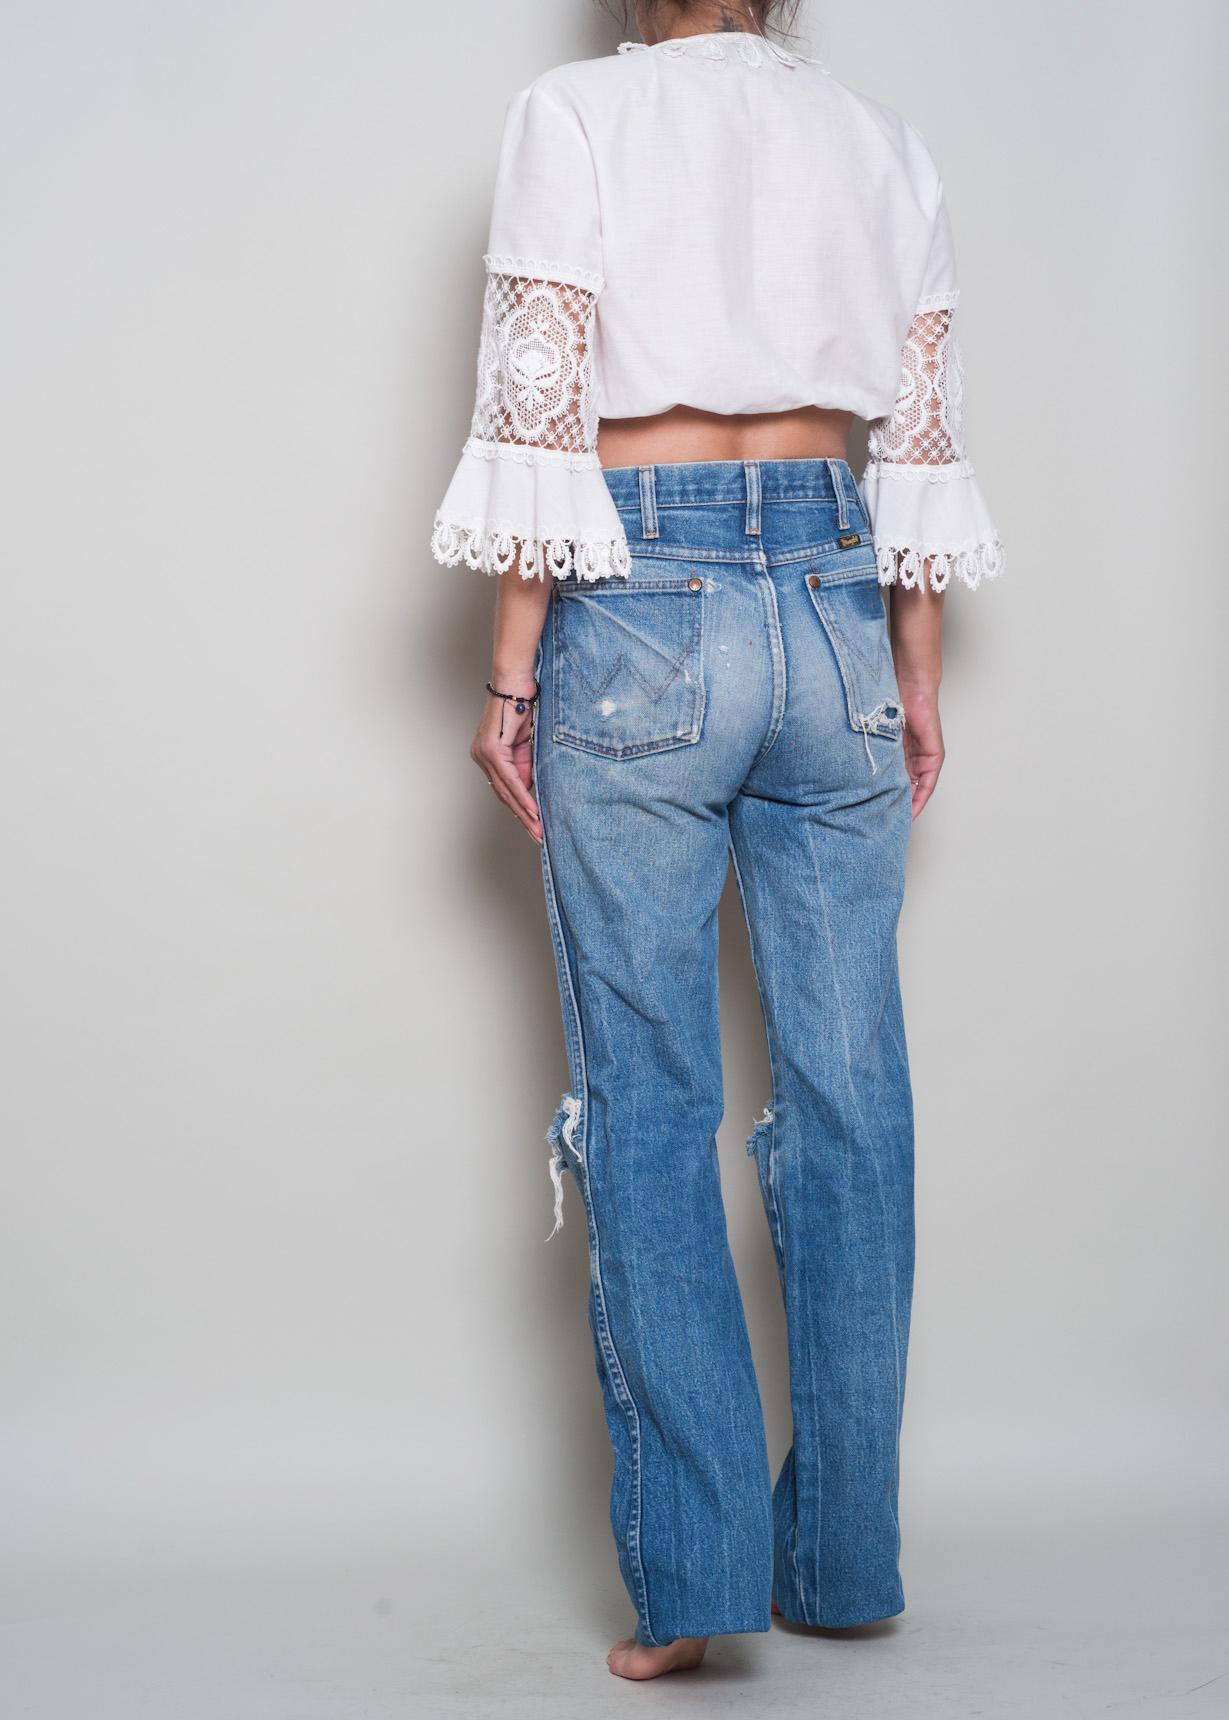 edee3641 1980s// Perfectly Worn WRANGLER High Waist Denim Boyfriend Jeans// 27